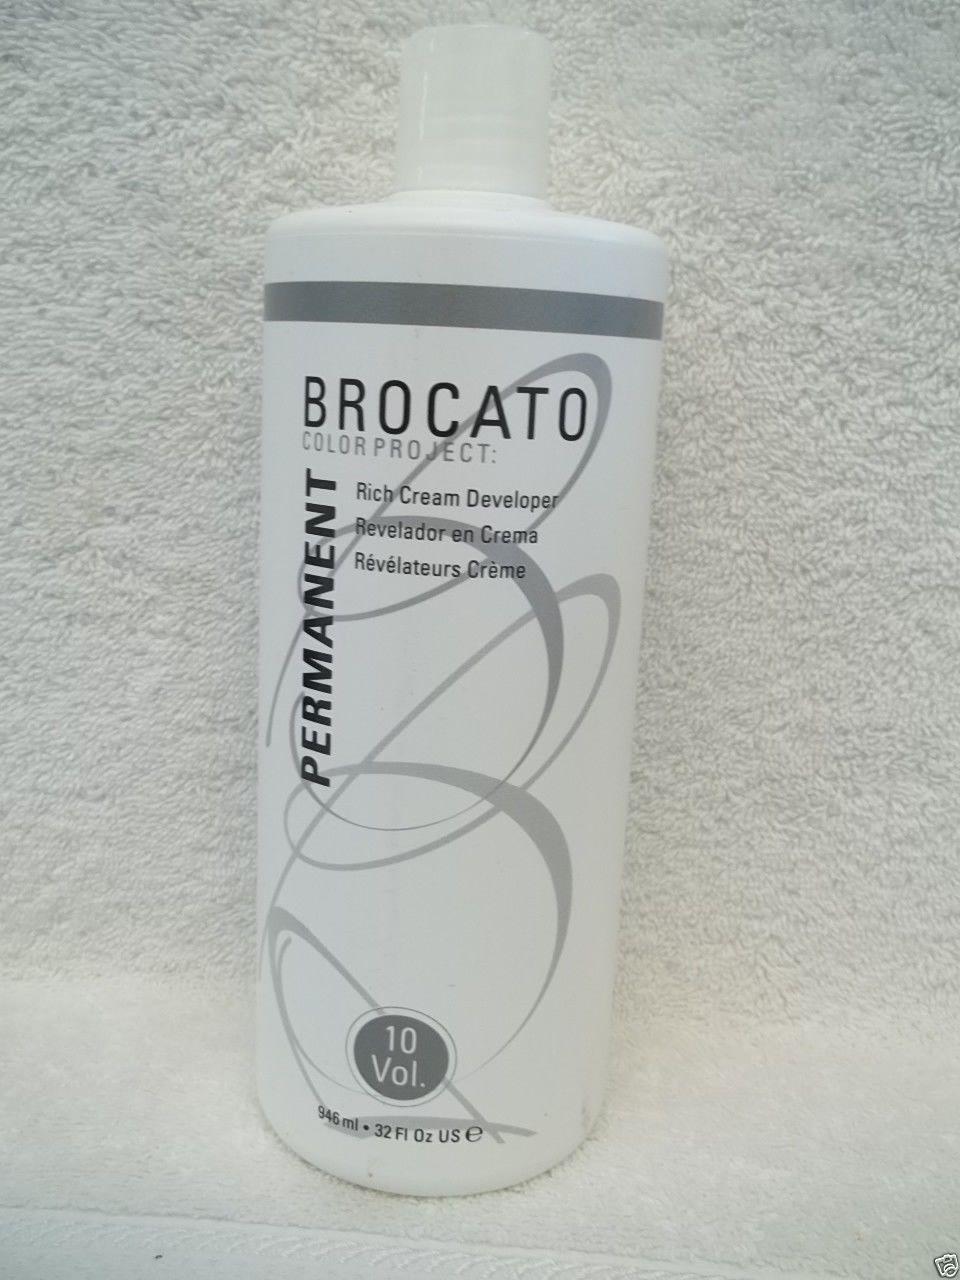 Brocato Brush 1 Listing